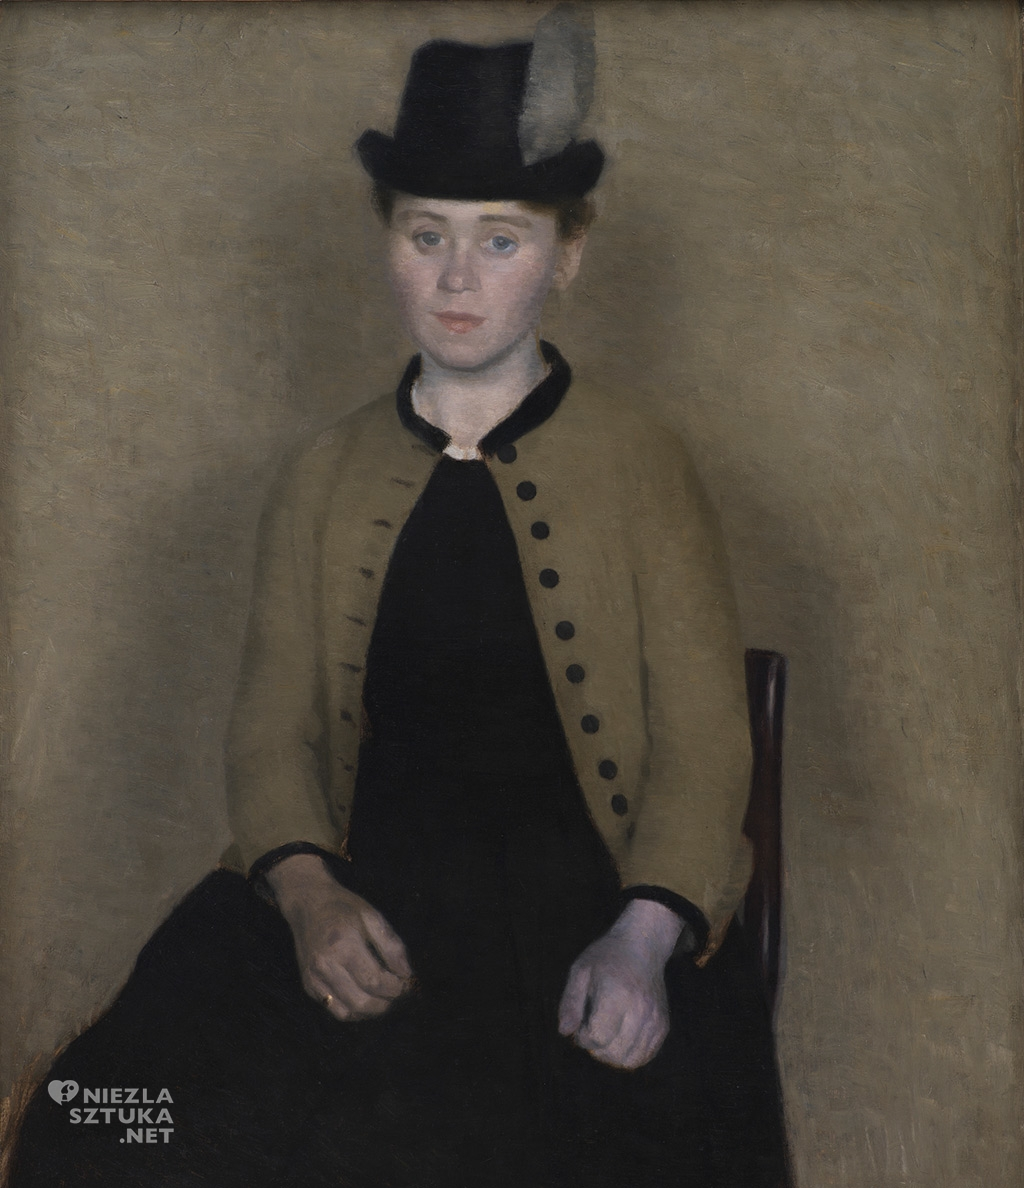 Vilhelm Hammershøi, Portret Idy Ilsted, żony artysty | 1890